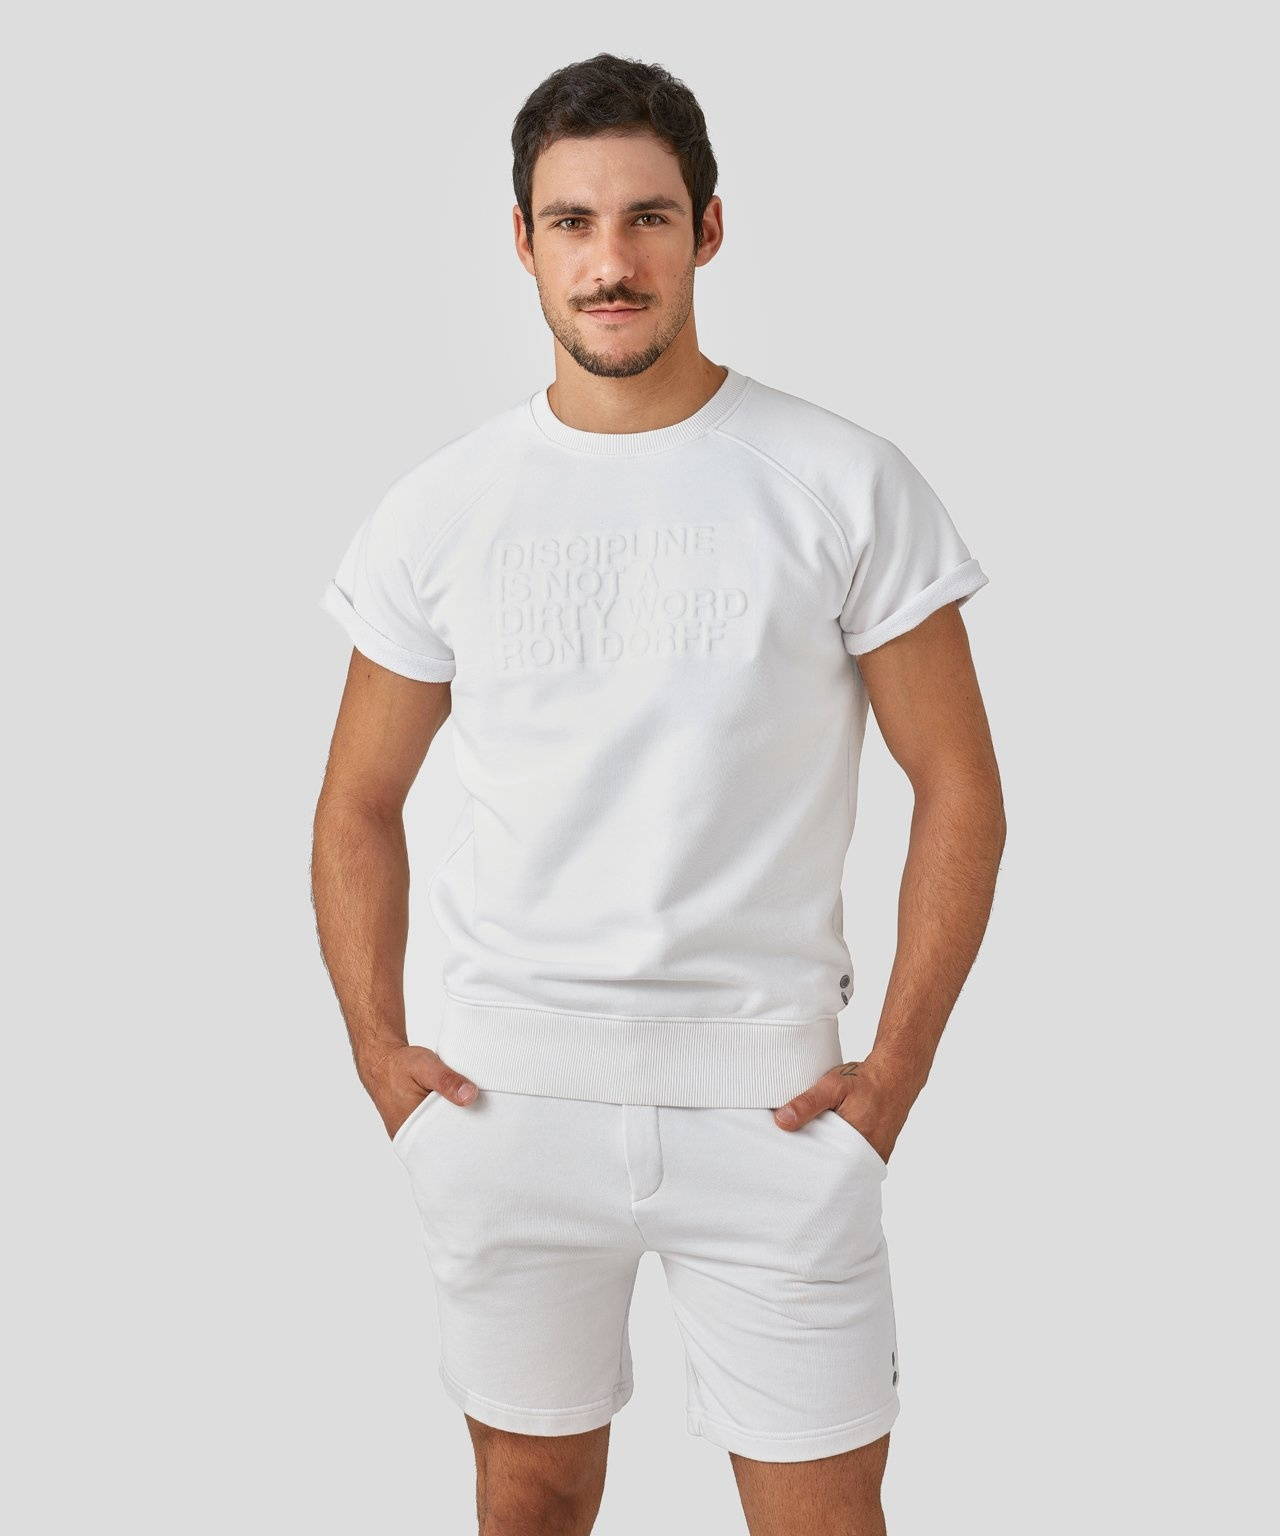 Ron Dorff DISCIPLINE shrt slv sweatshirt